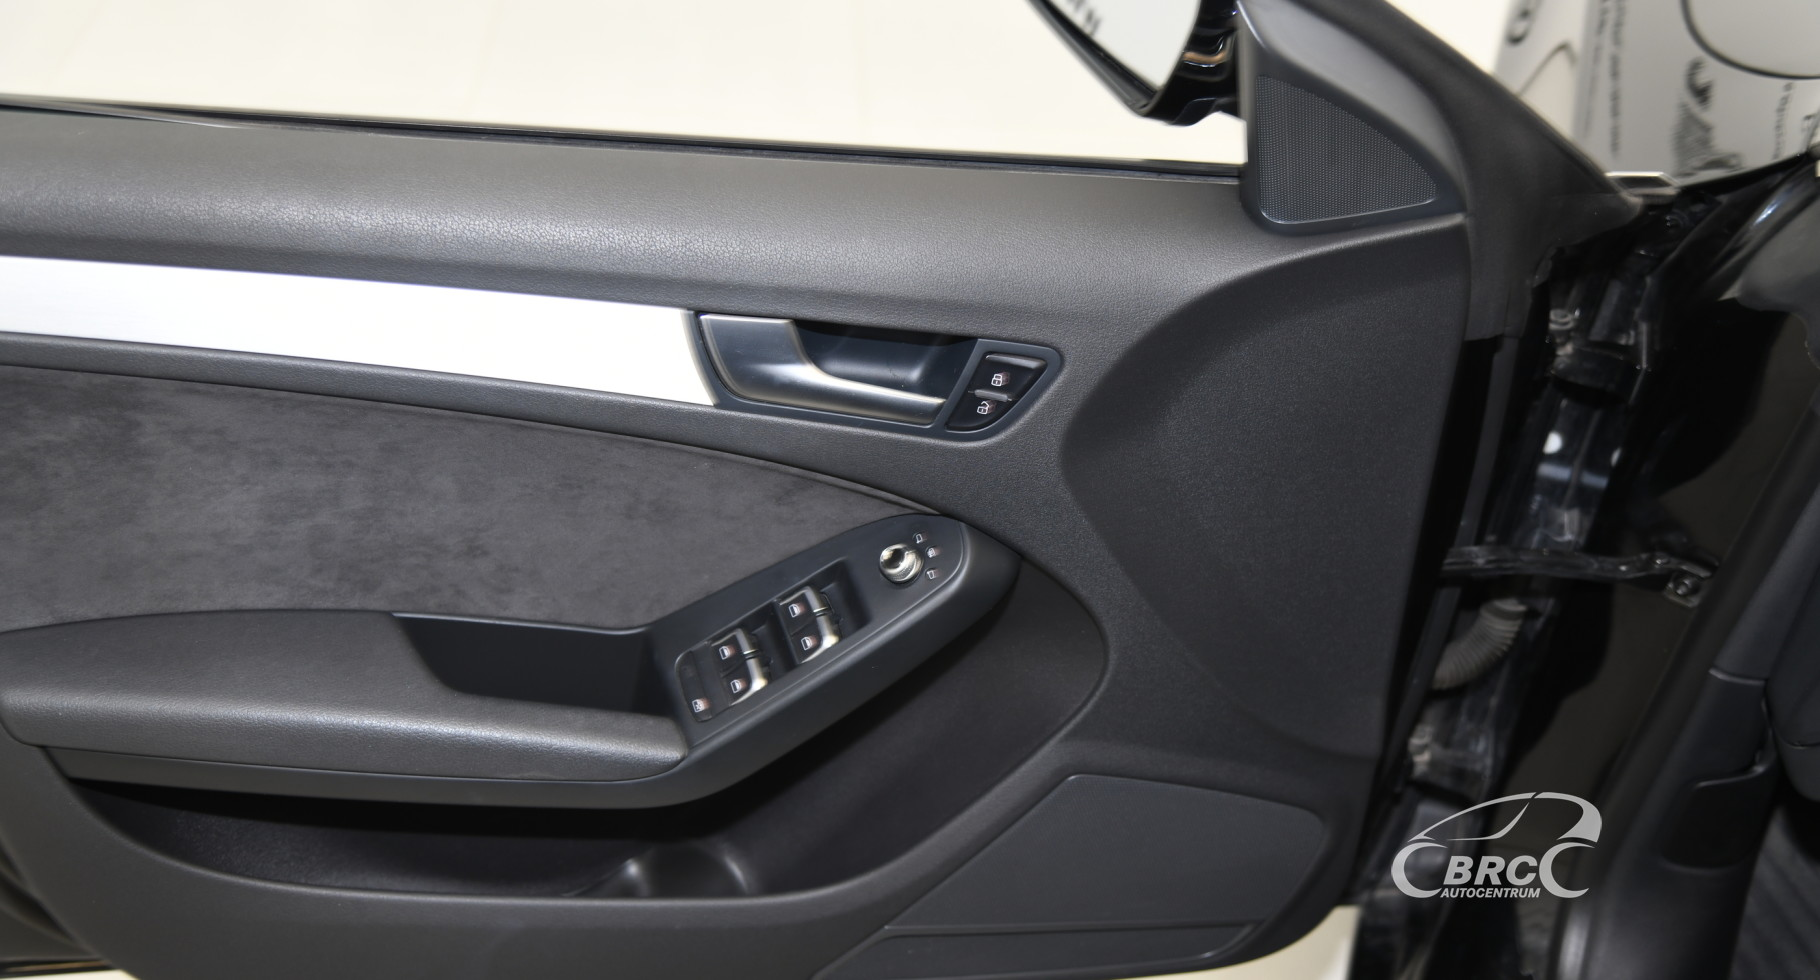 Audi A5 Sportback 3.0 TDI Quattro S-Line Automatas